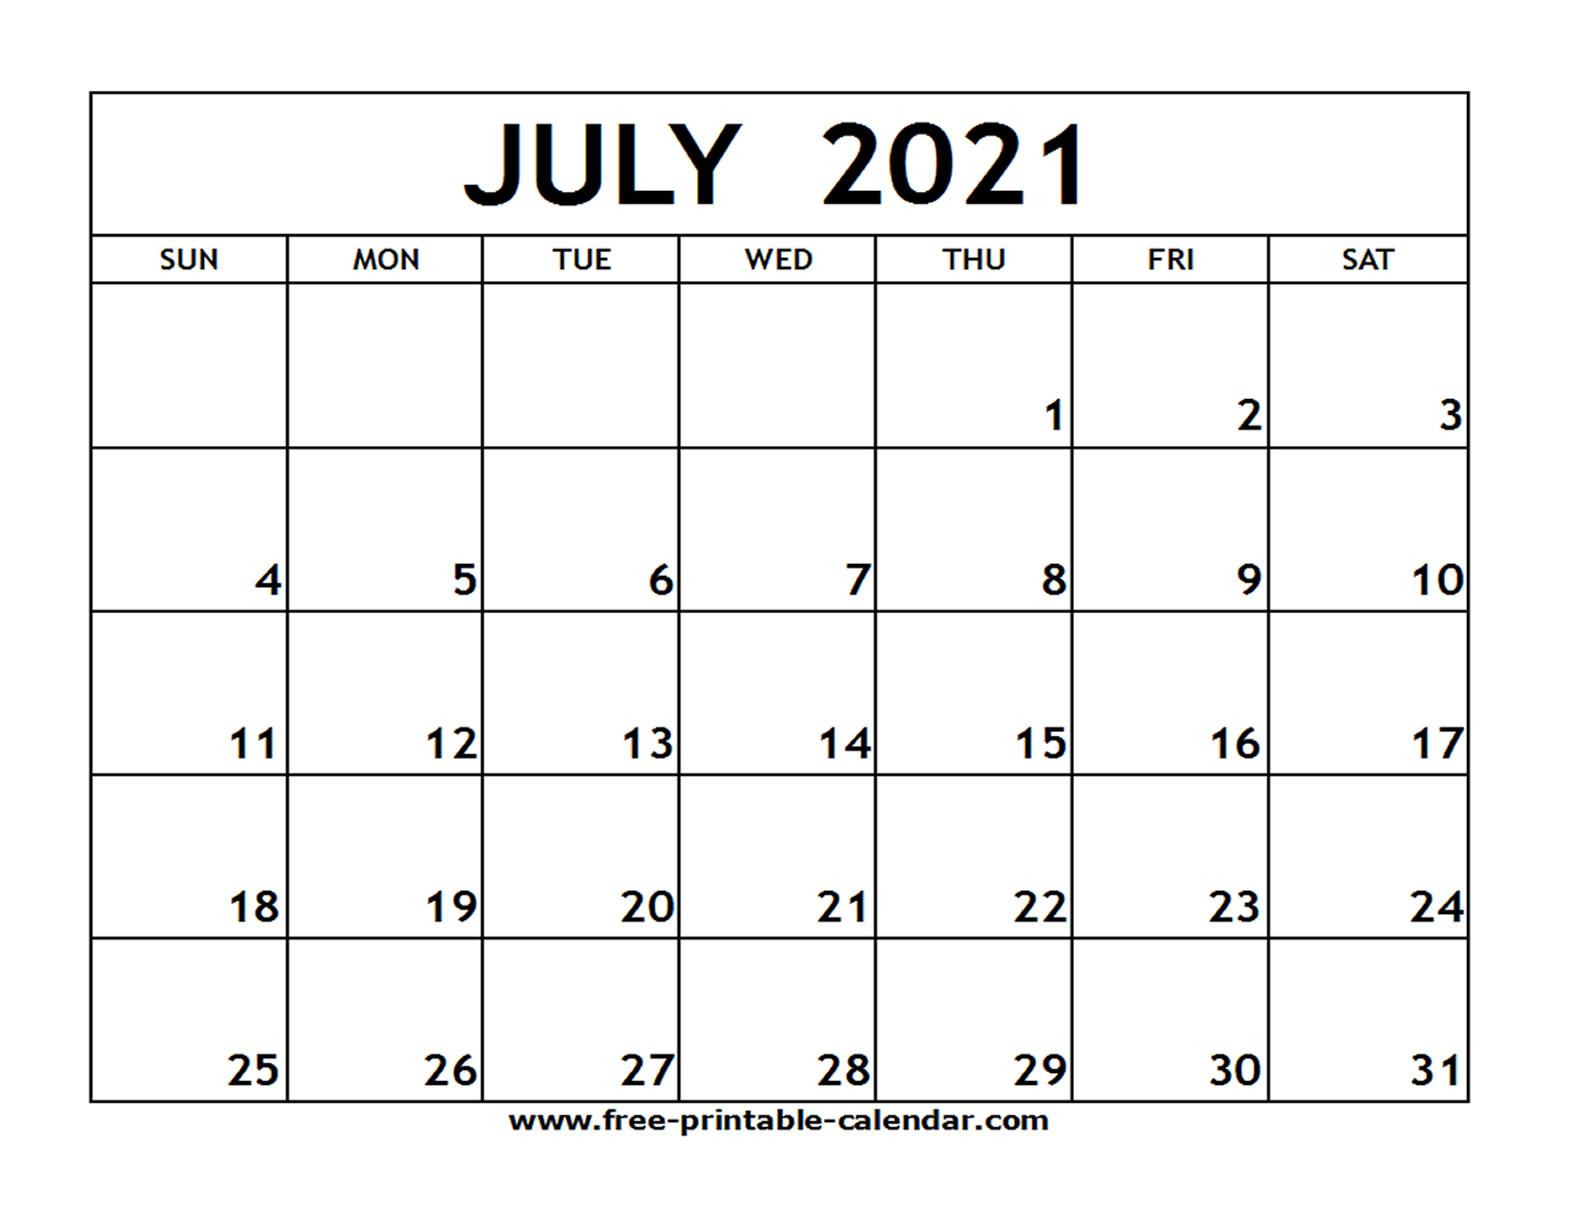 July 2021 Printable Calendar - Free-Printable-Calendar